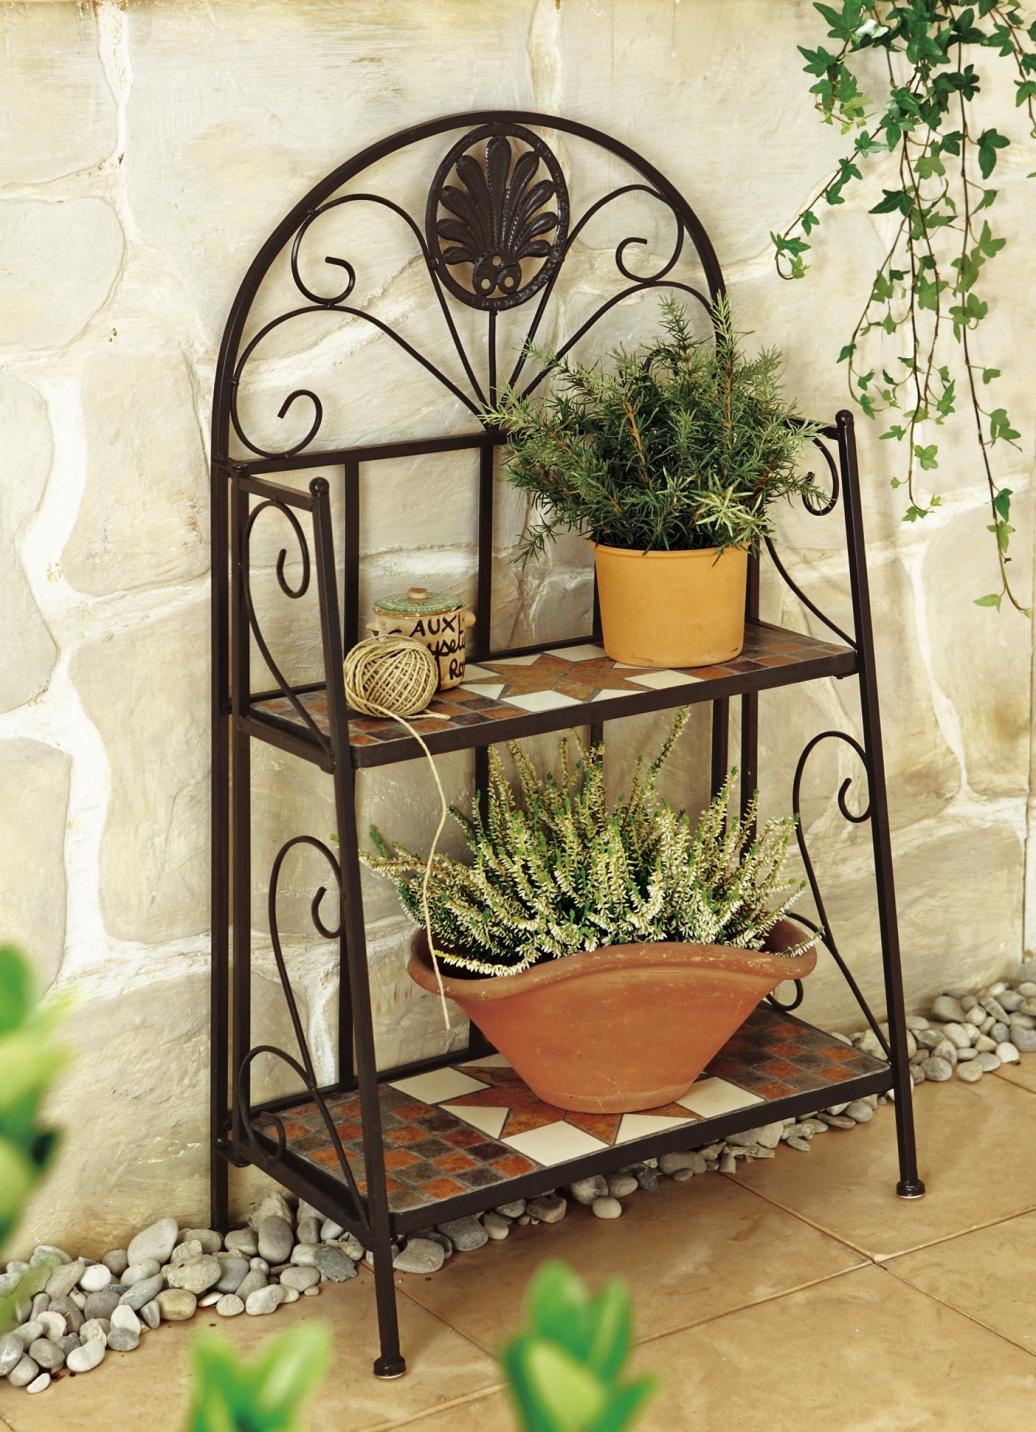 mosaik regal gartenm bel brigitte hachenburg. Black Bedroom Furniture Sets. Home Design Ideas